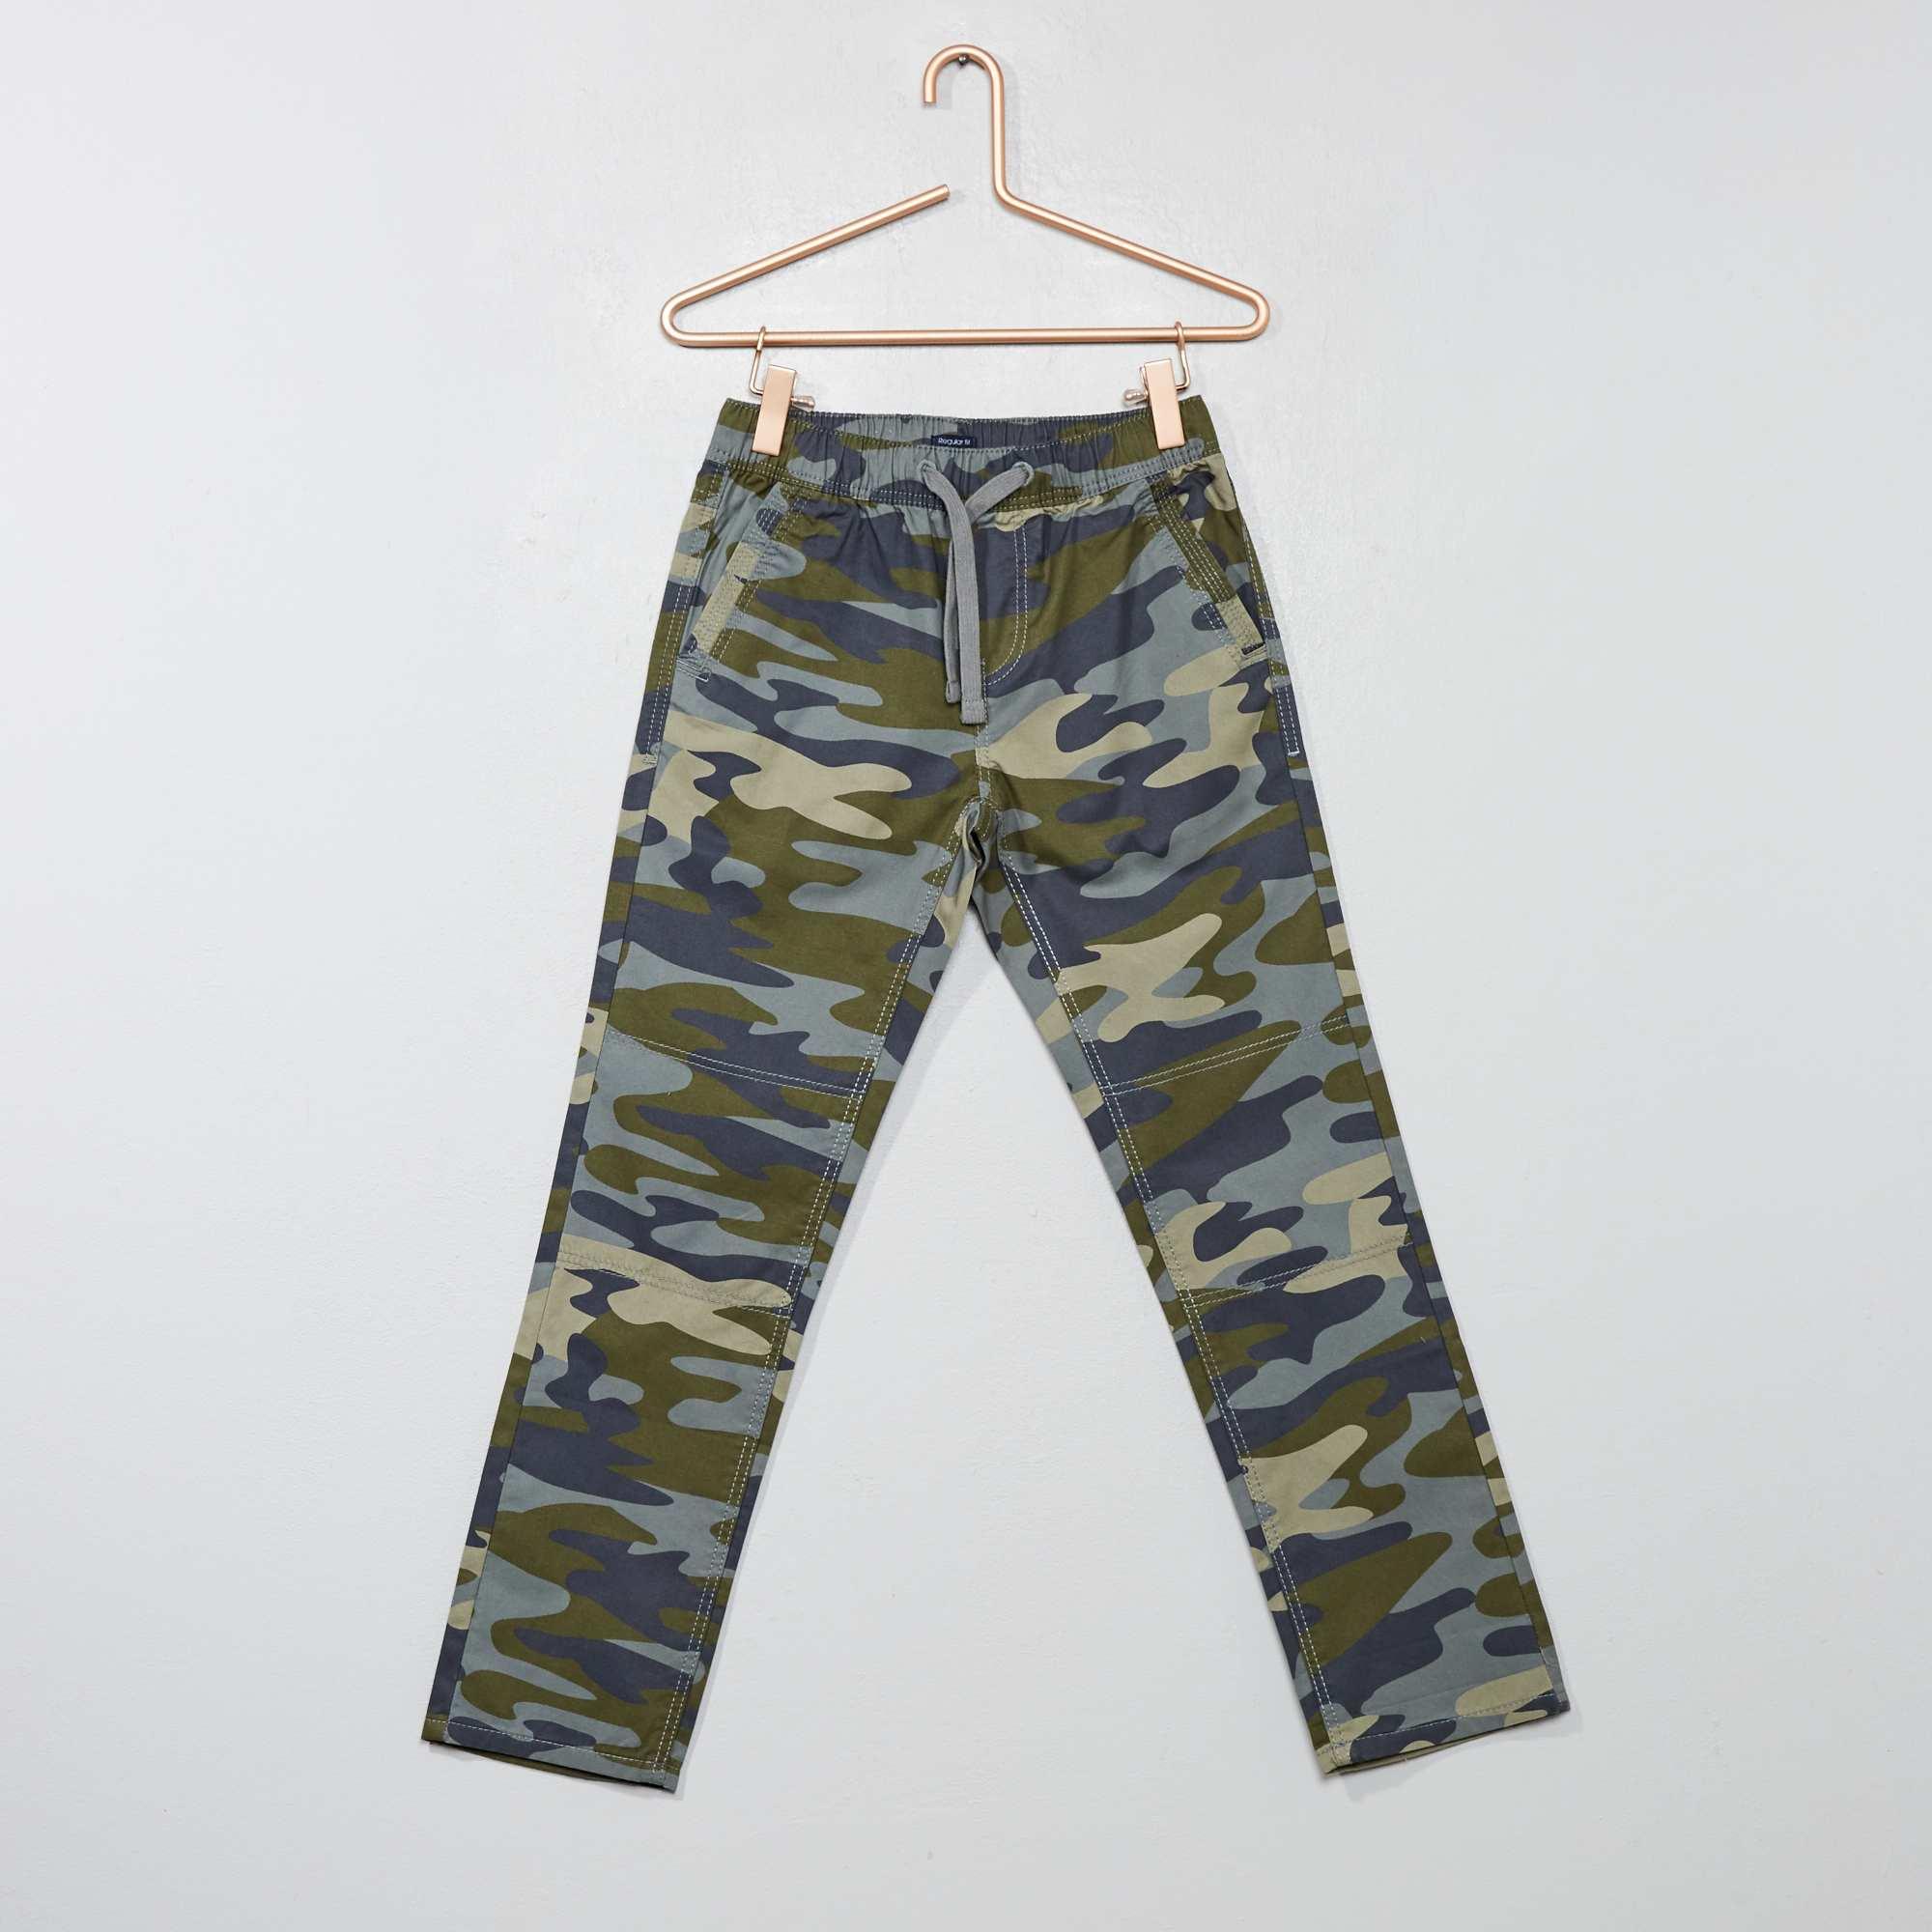 Camouflage Pantalon Regular Camouflage Pantalon Pantalon Regular Camouflage Pantalon Regular Regular thQrsdCx